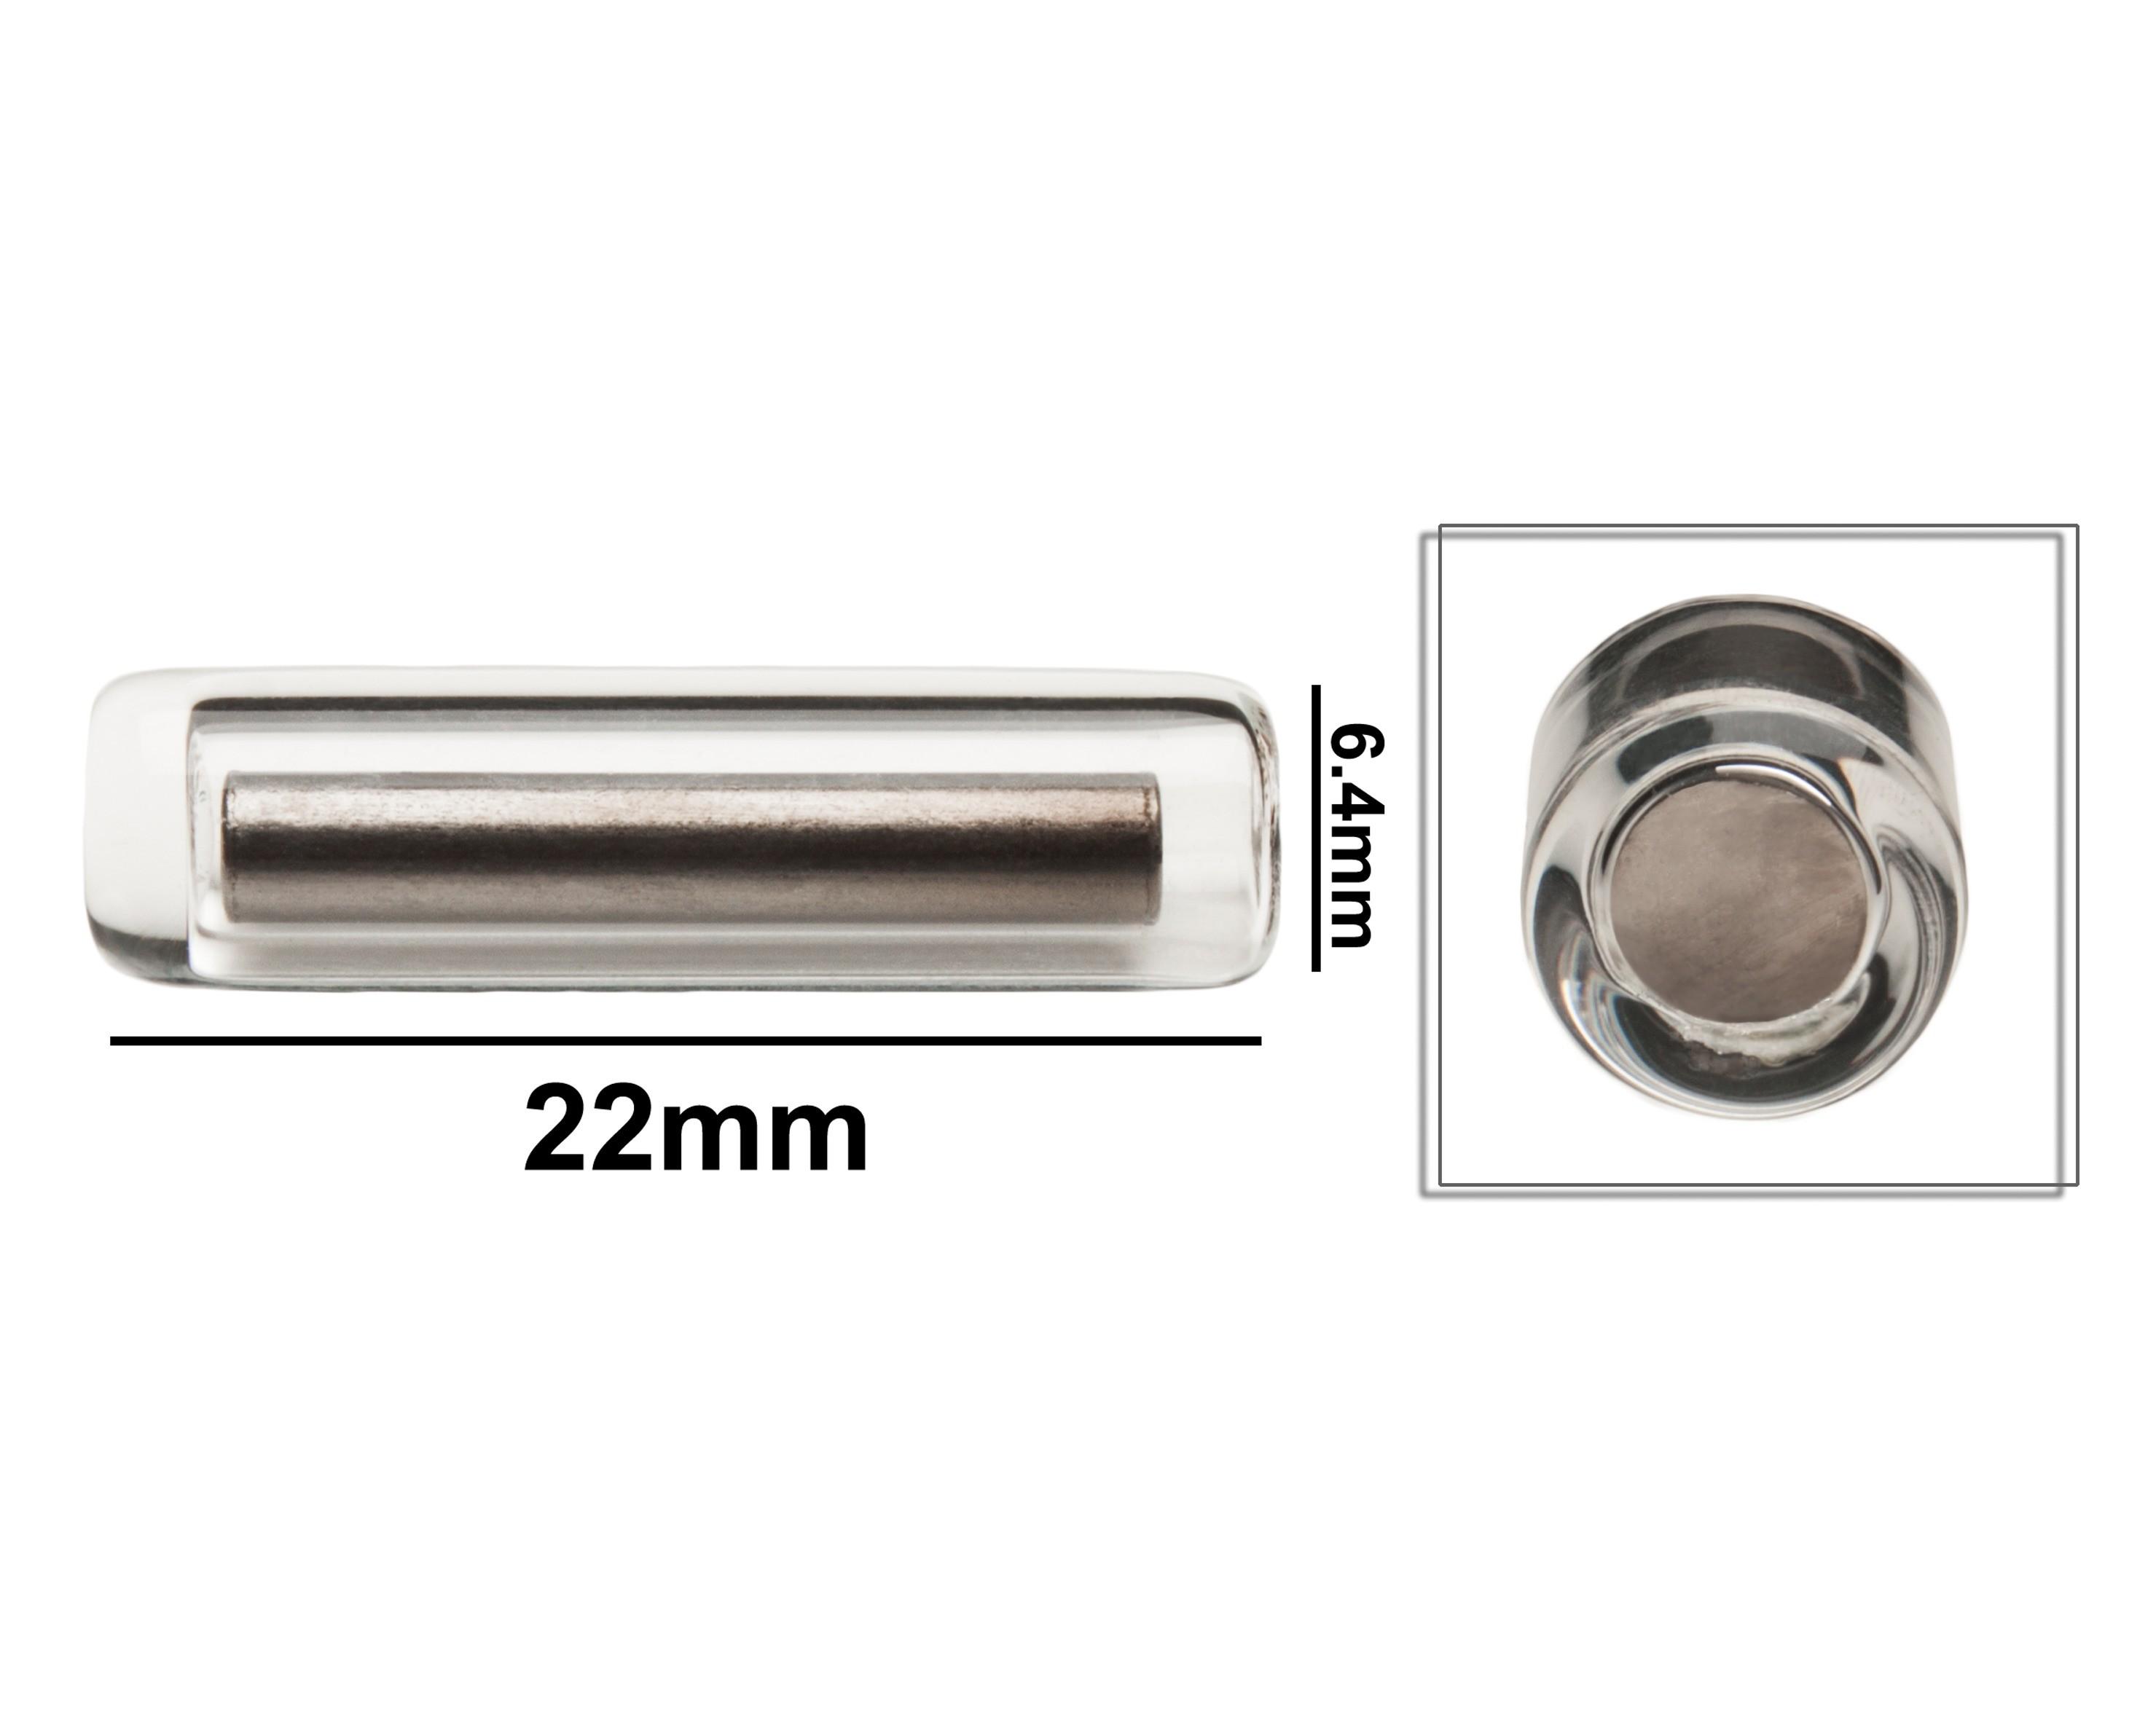 SP Bel-Art Pyrex Magnetic Stirring Bar; Glass Encapsulated, 22 x 6.4mm